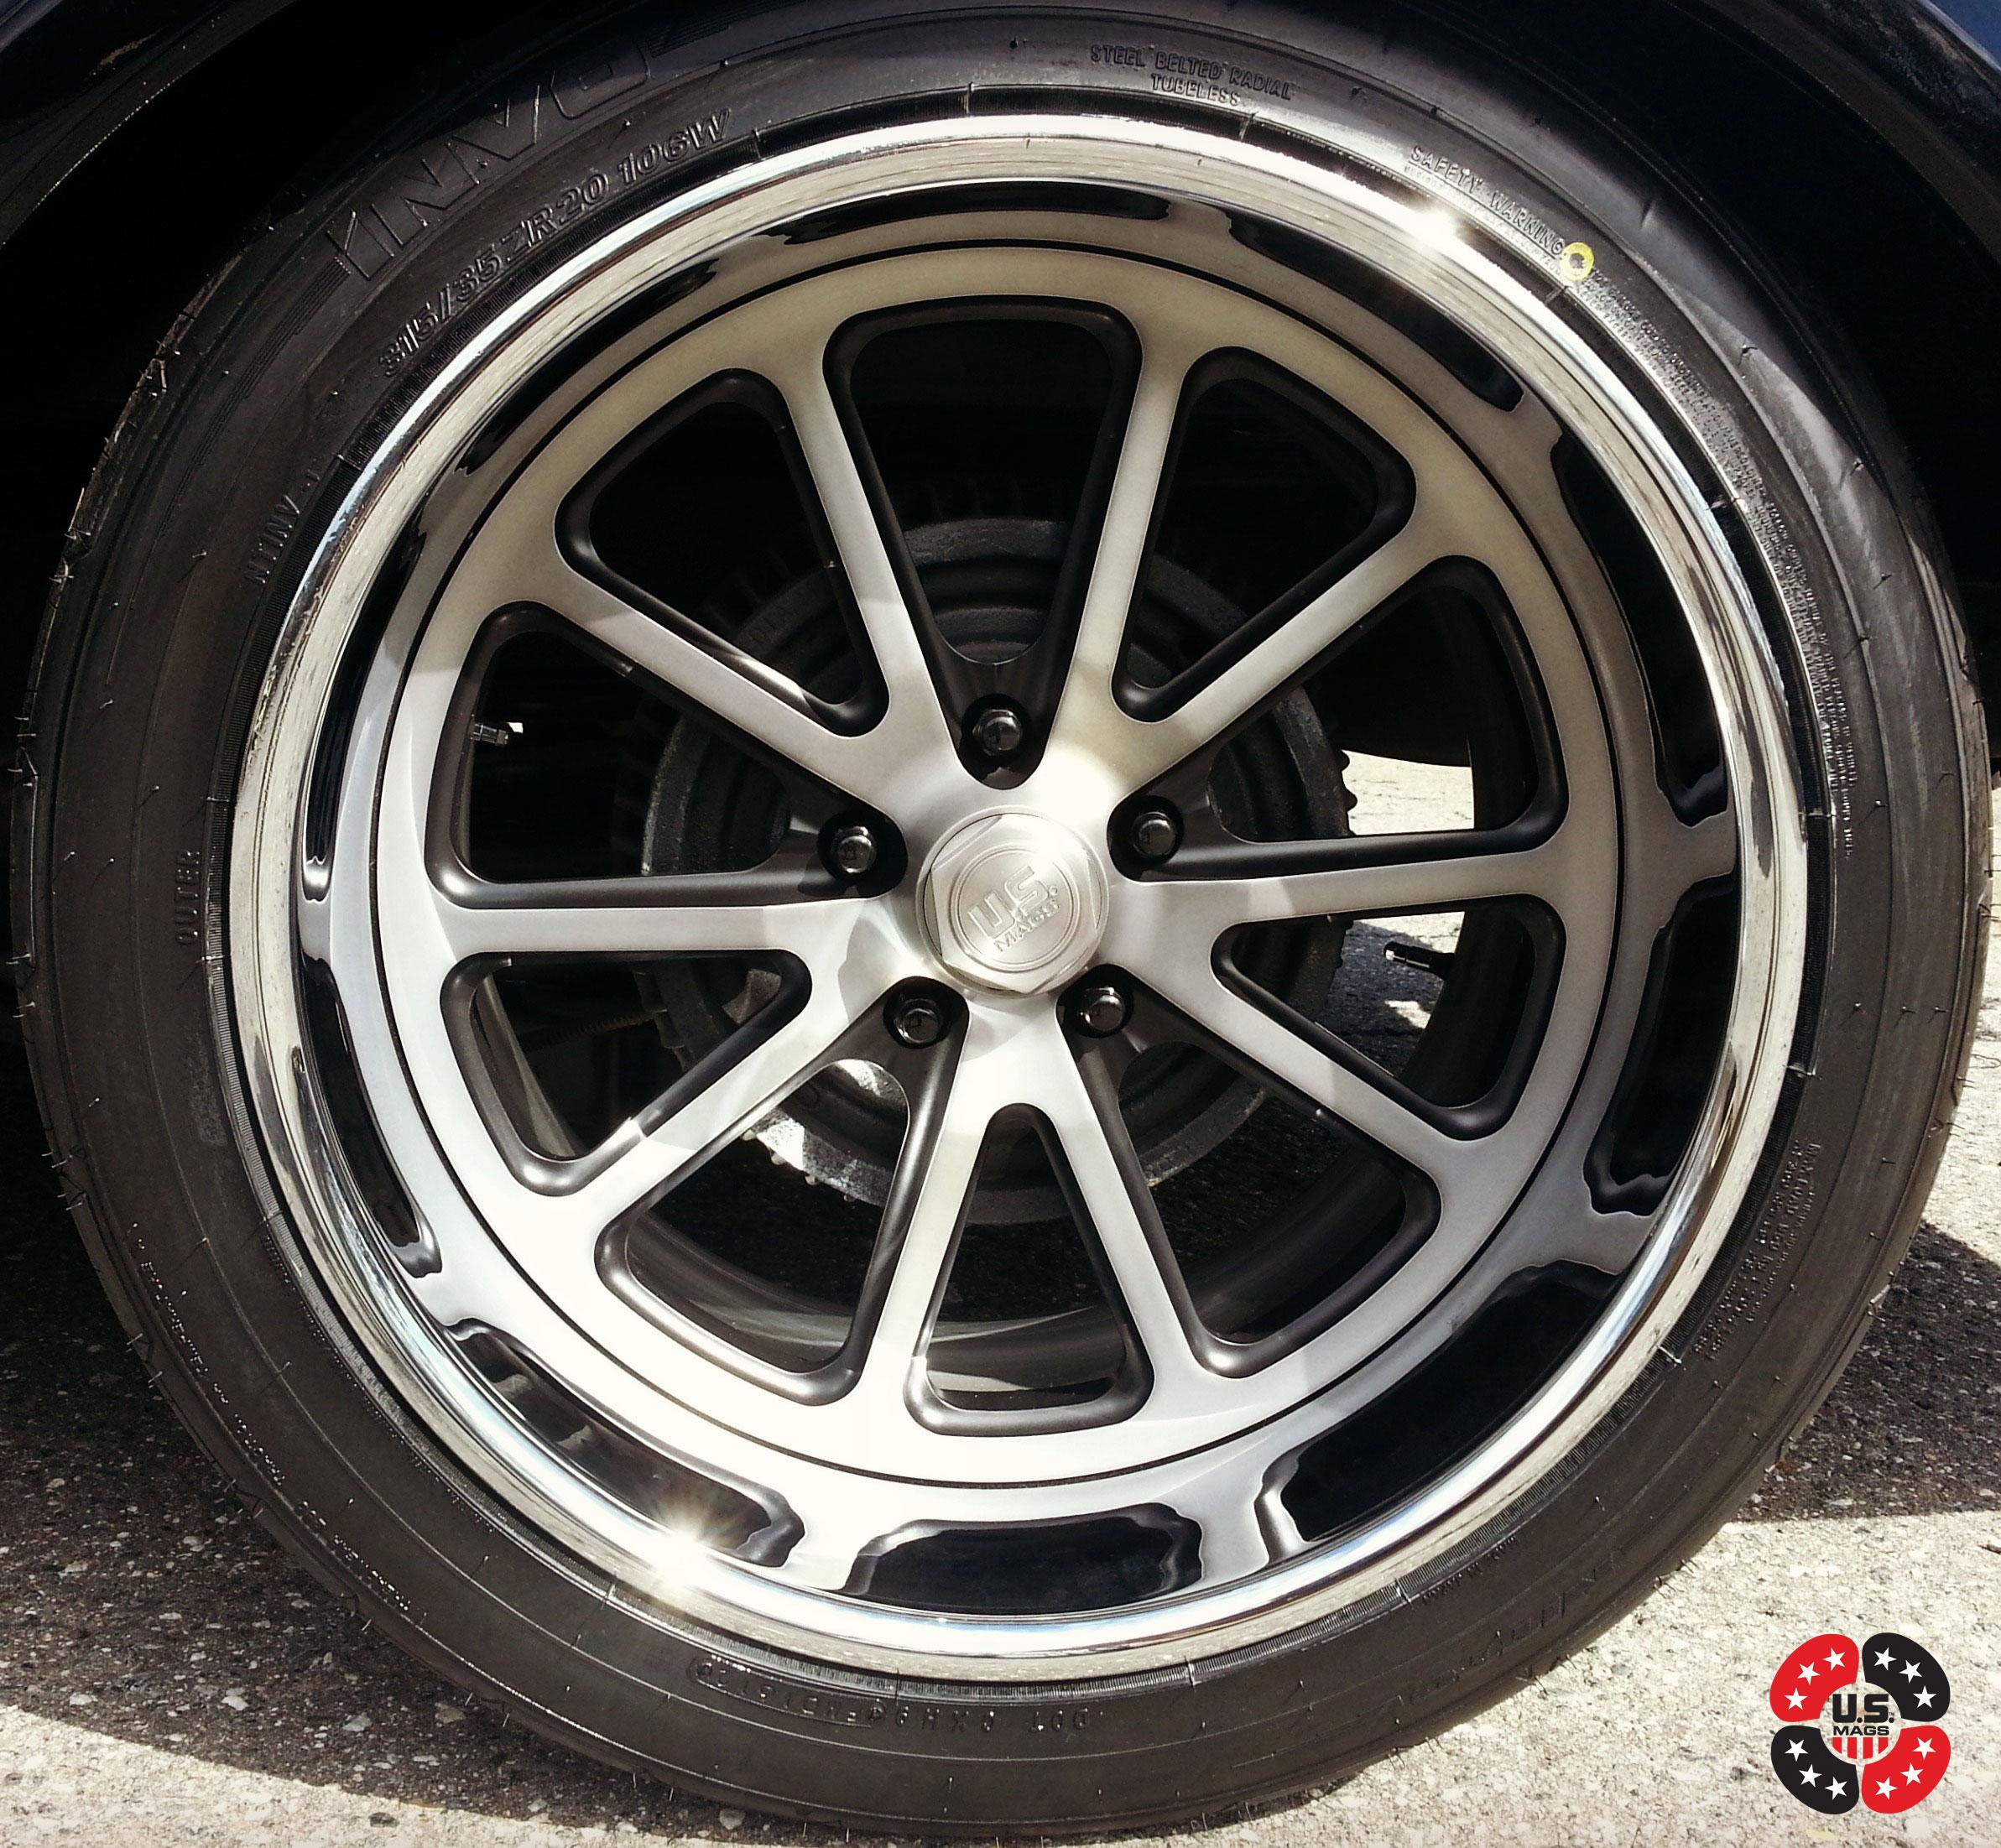 Chevrolet Cheyenne Rambler U425 Gallery Mht Wheels Inc